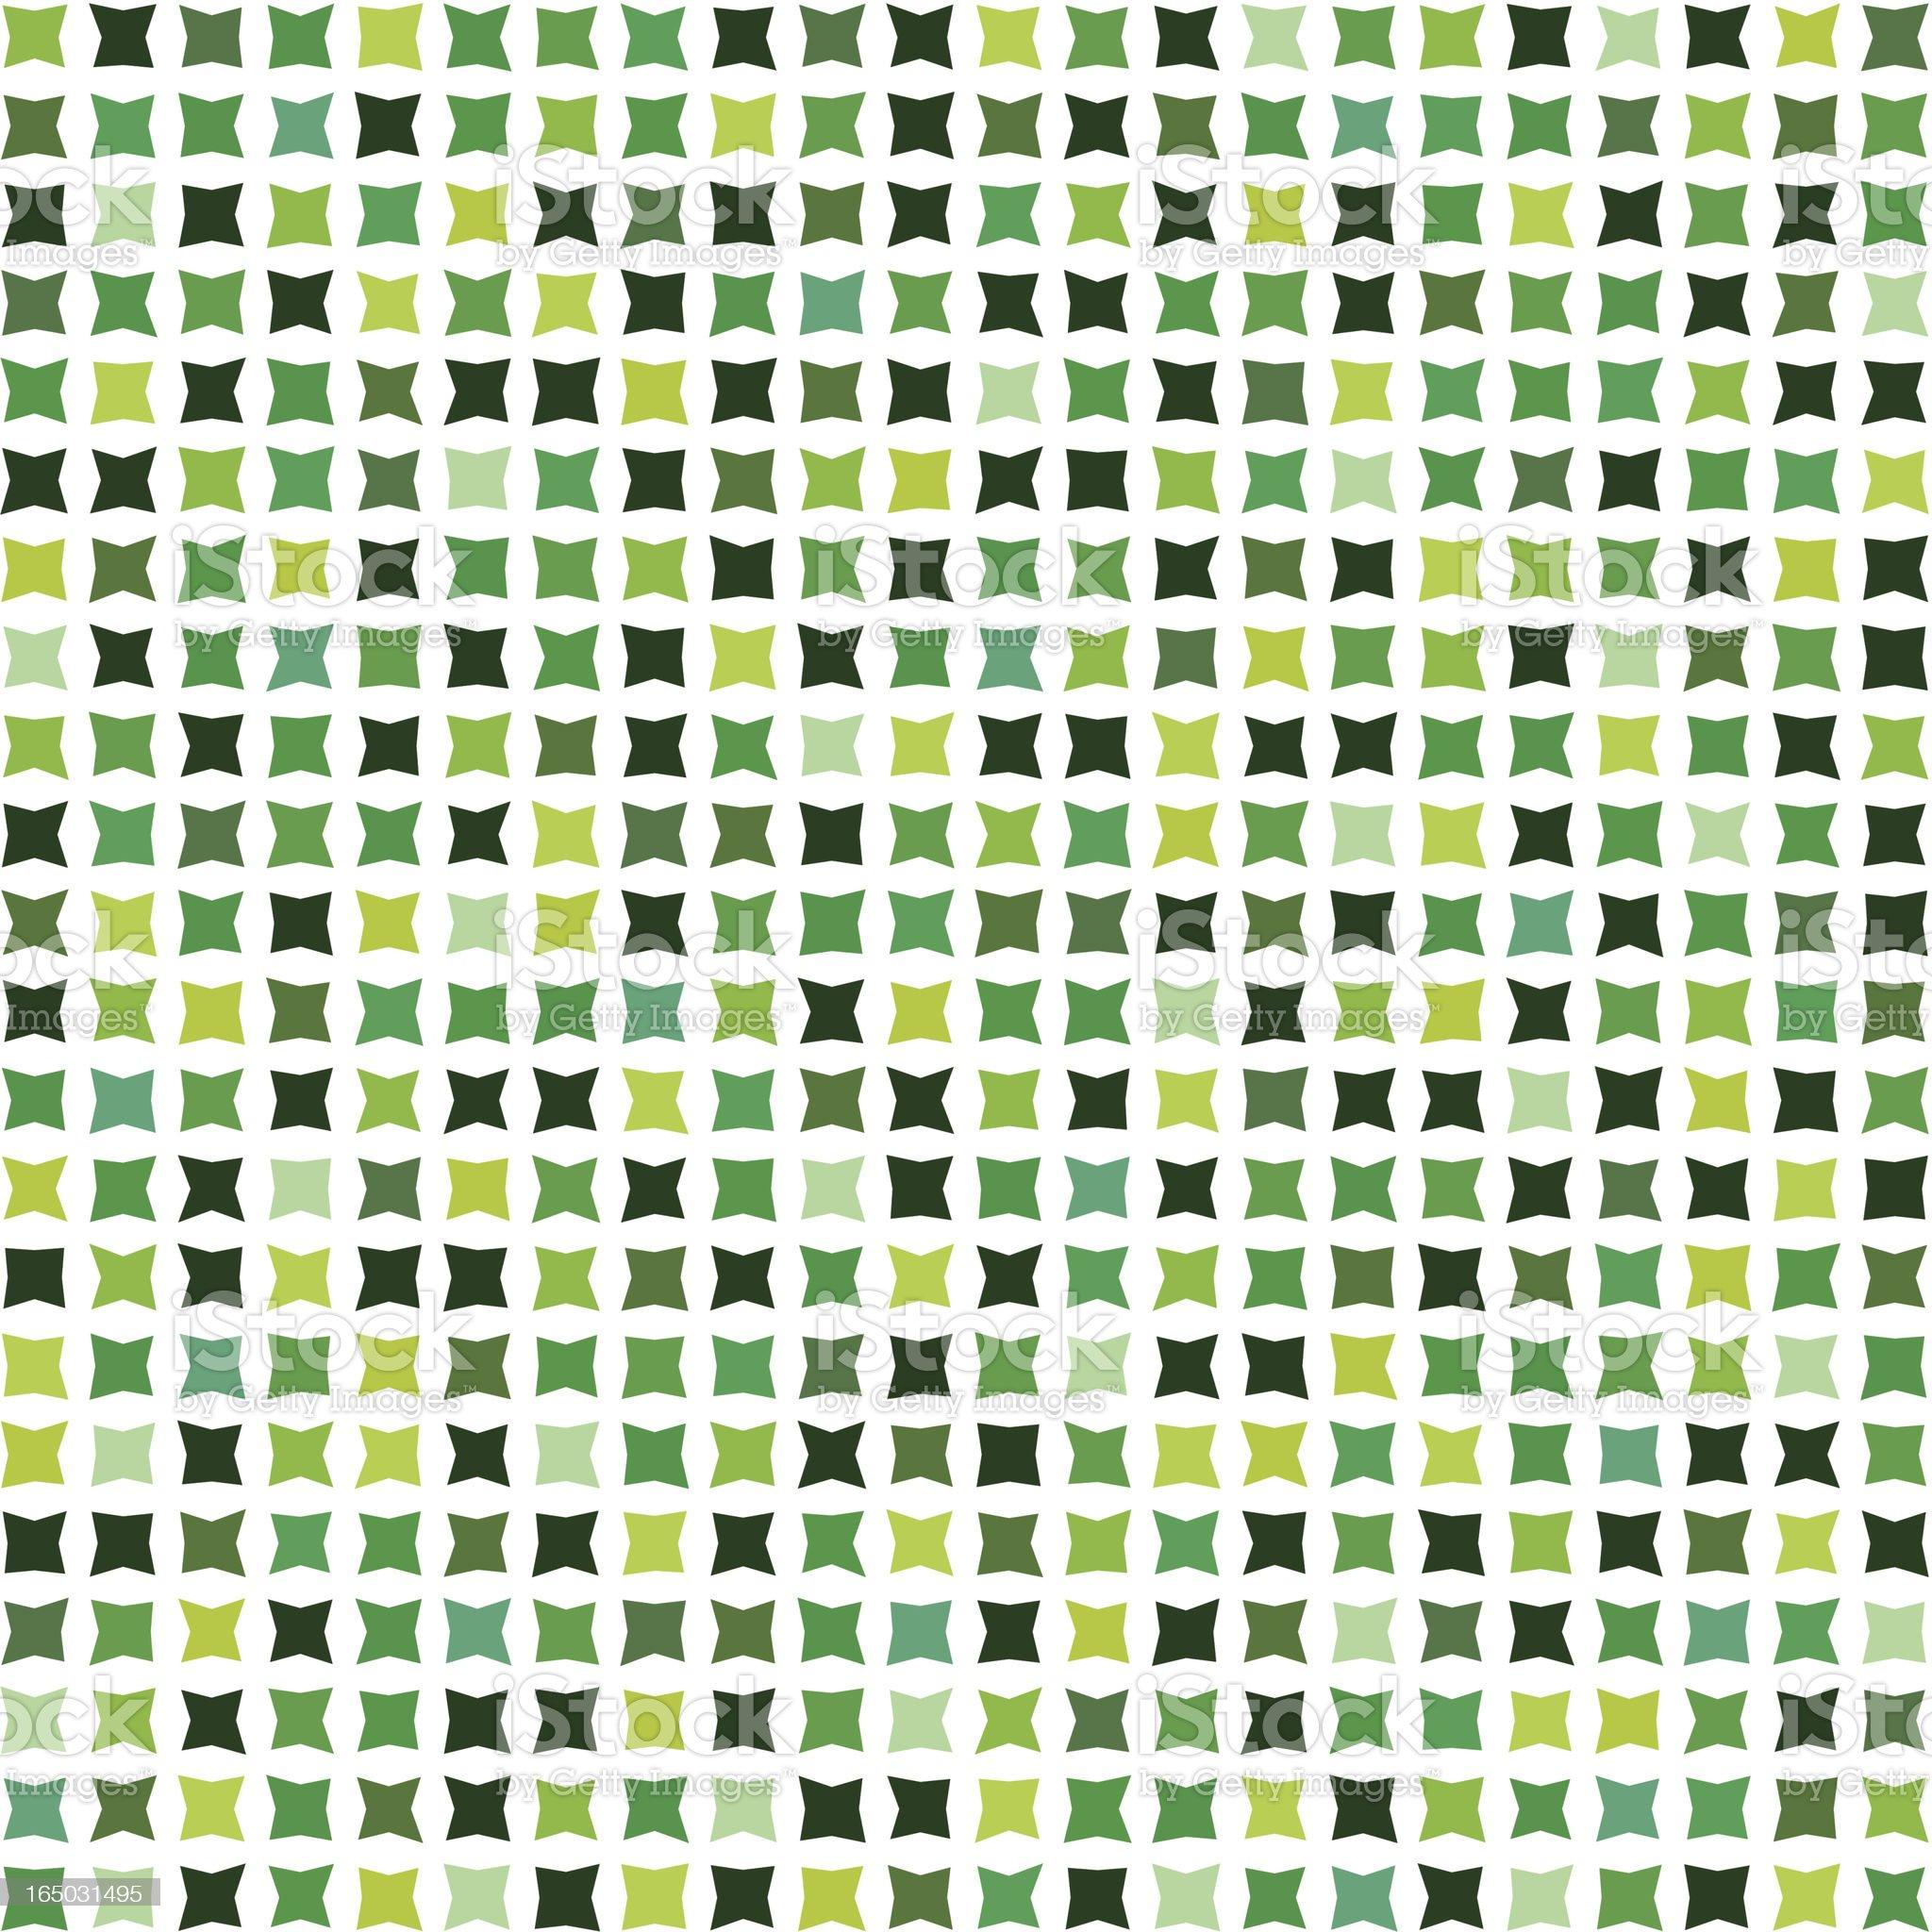 vector - Green color dots #2 royalty-free stock vector art